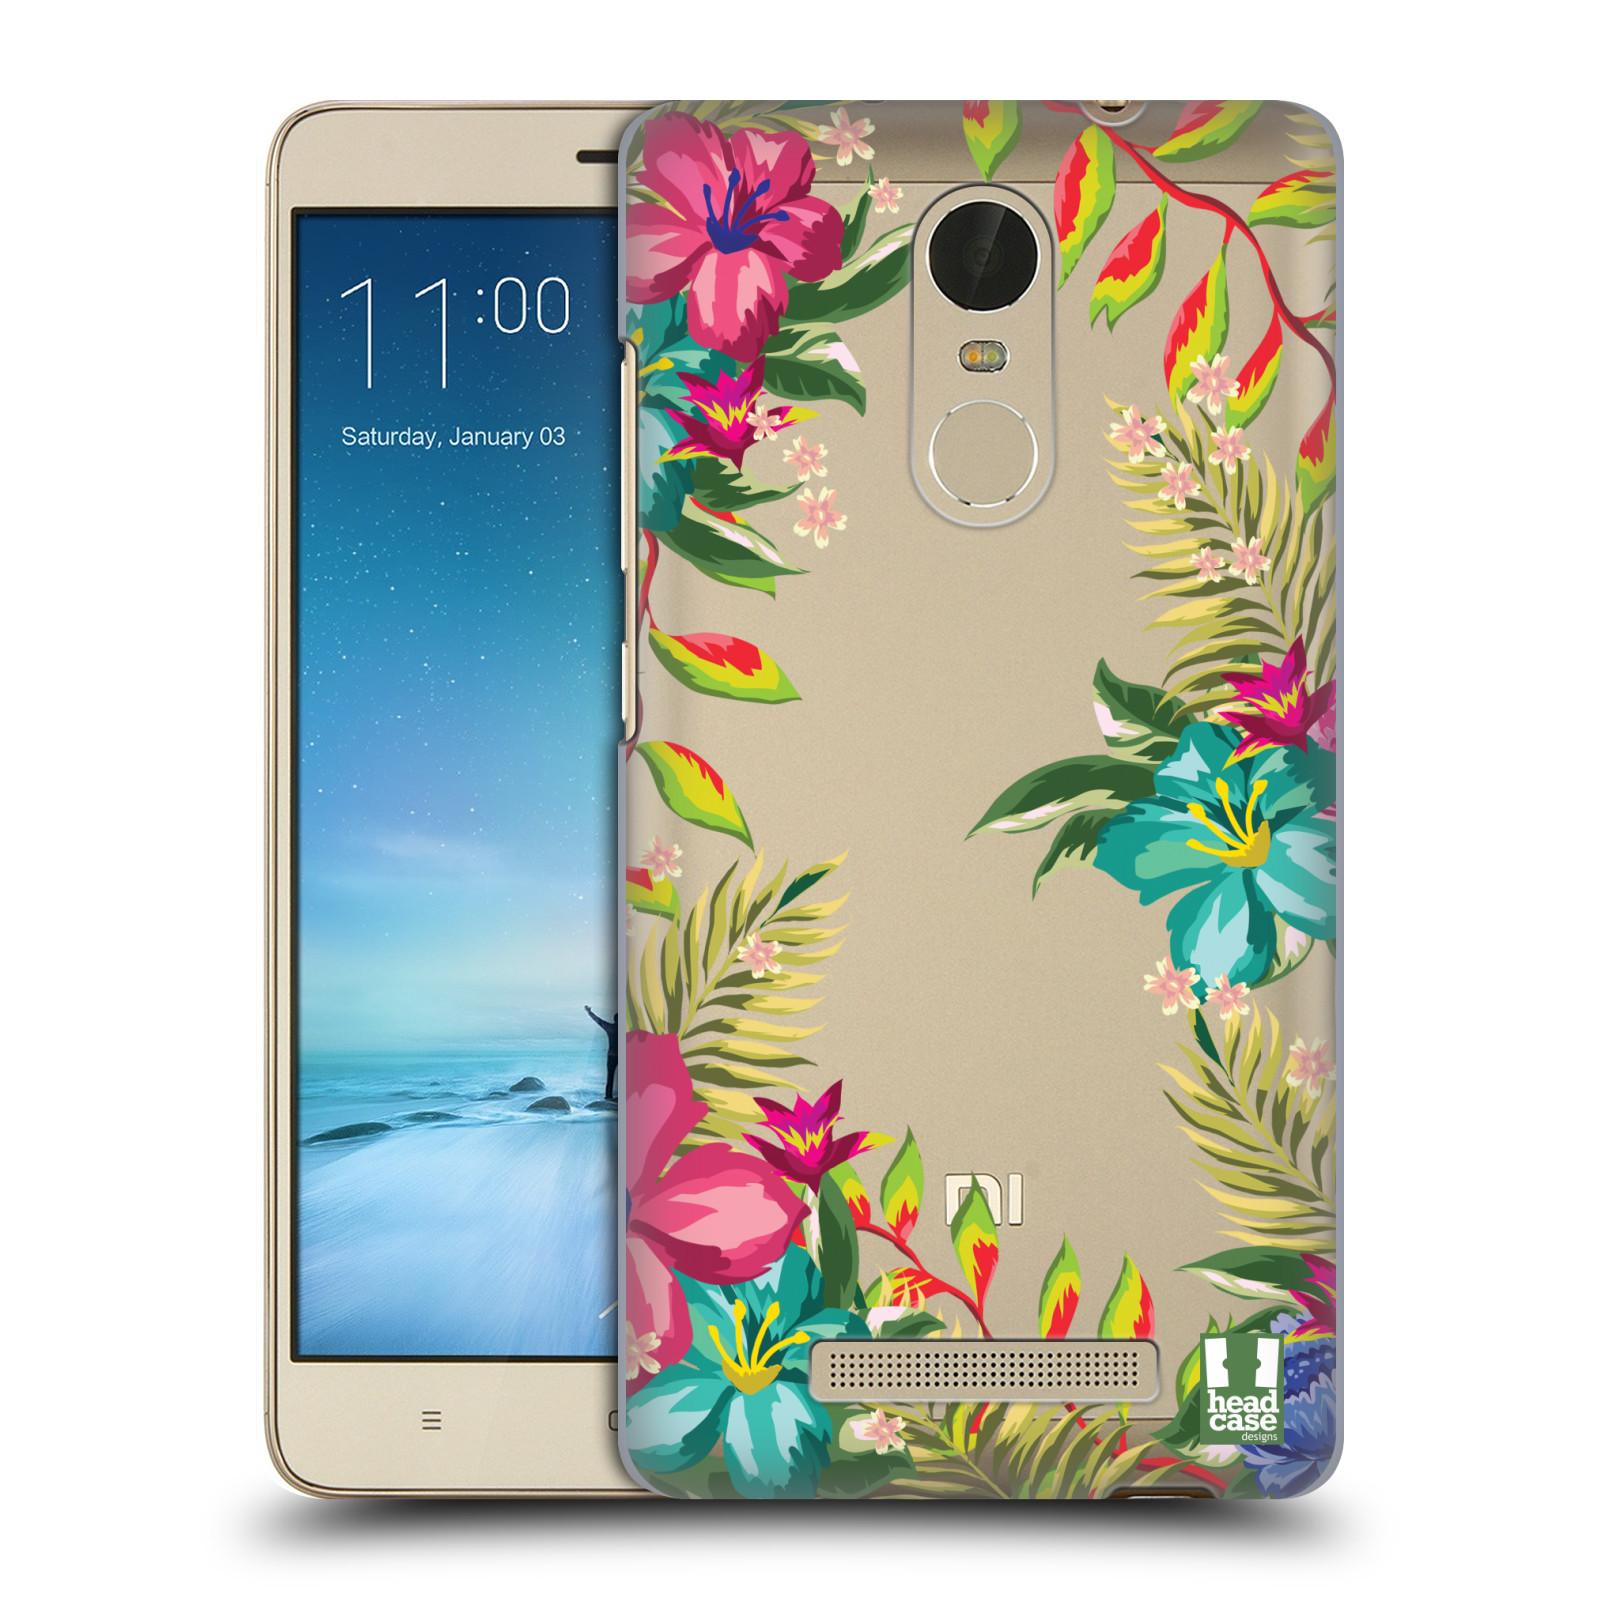 HEAD CASE DESIGNS FLOWER POWER HARD BACK CASE FOR XIAOMI PHONES